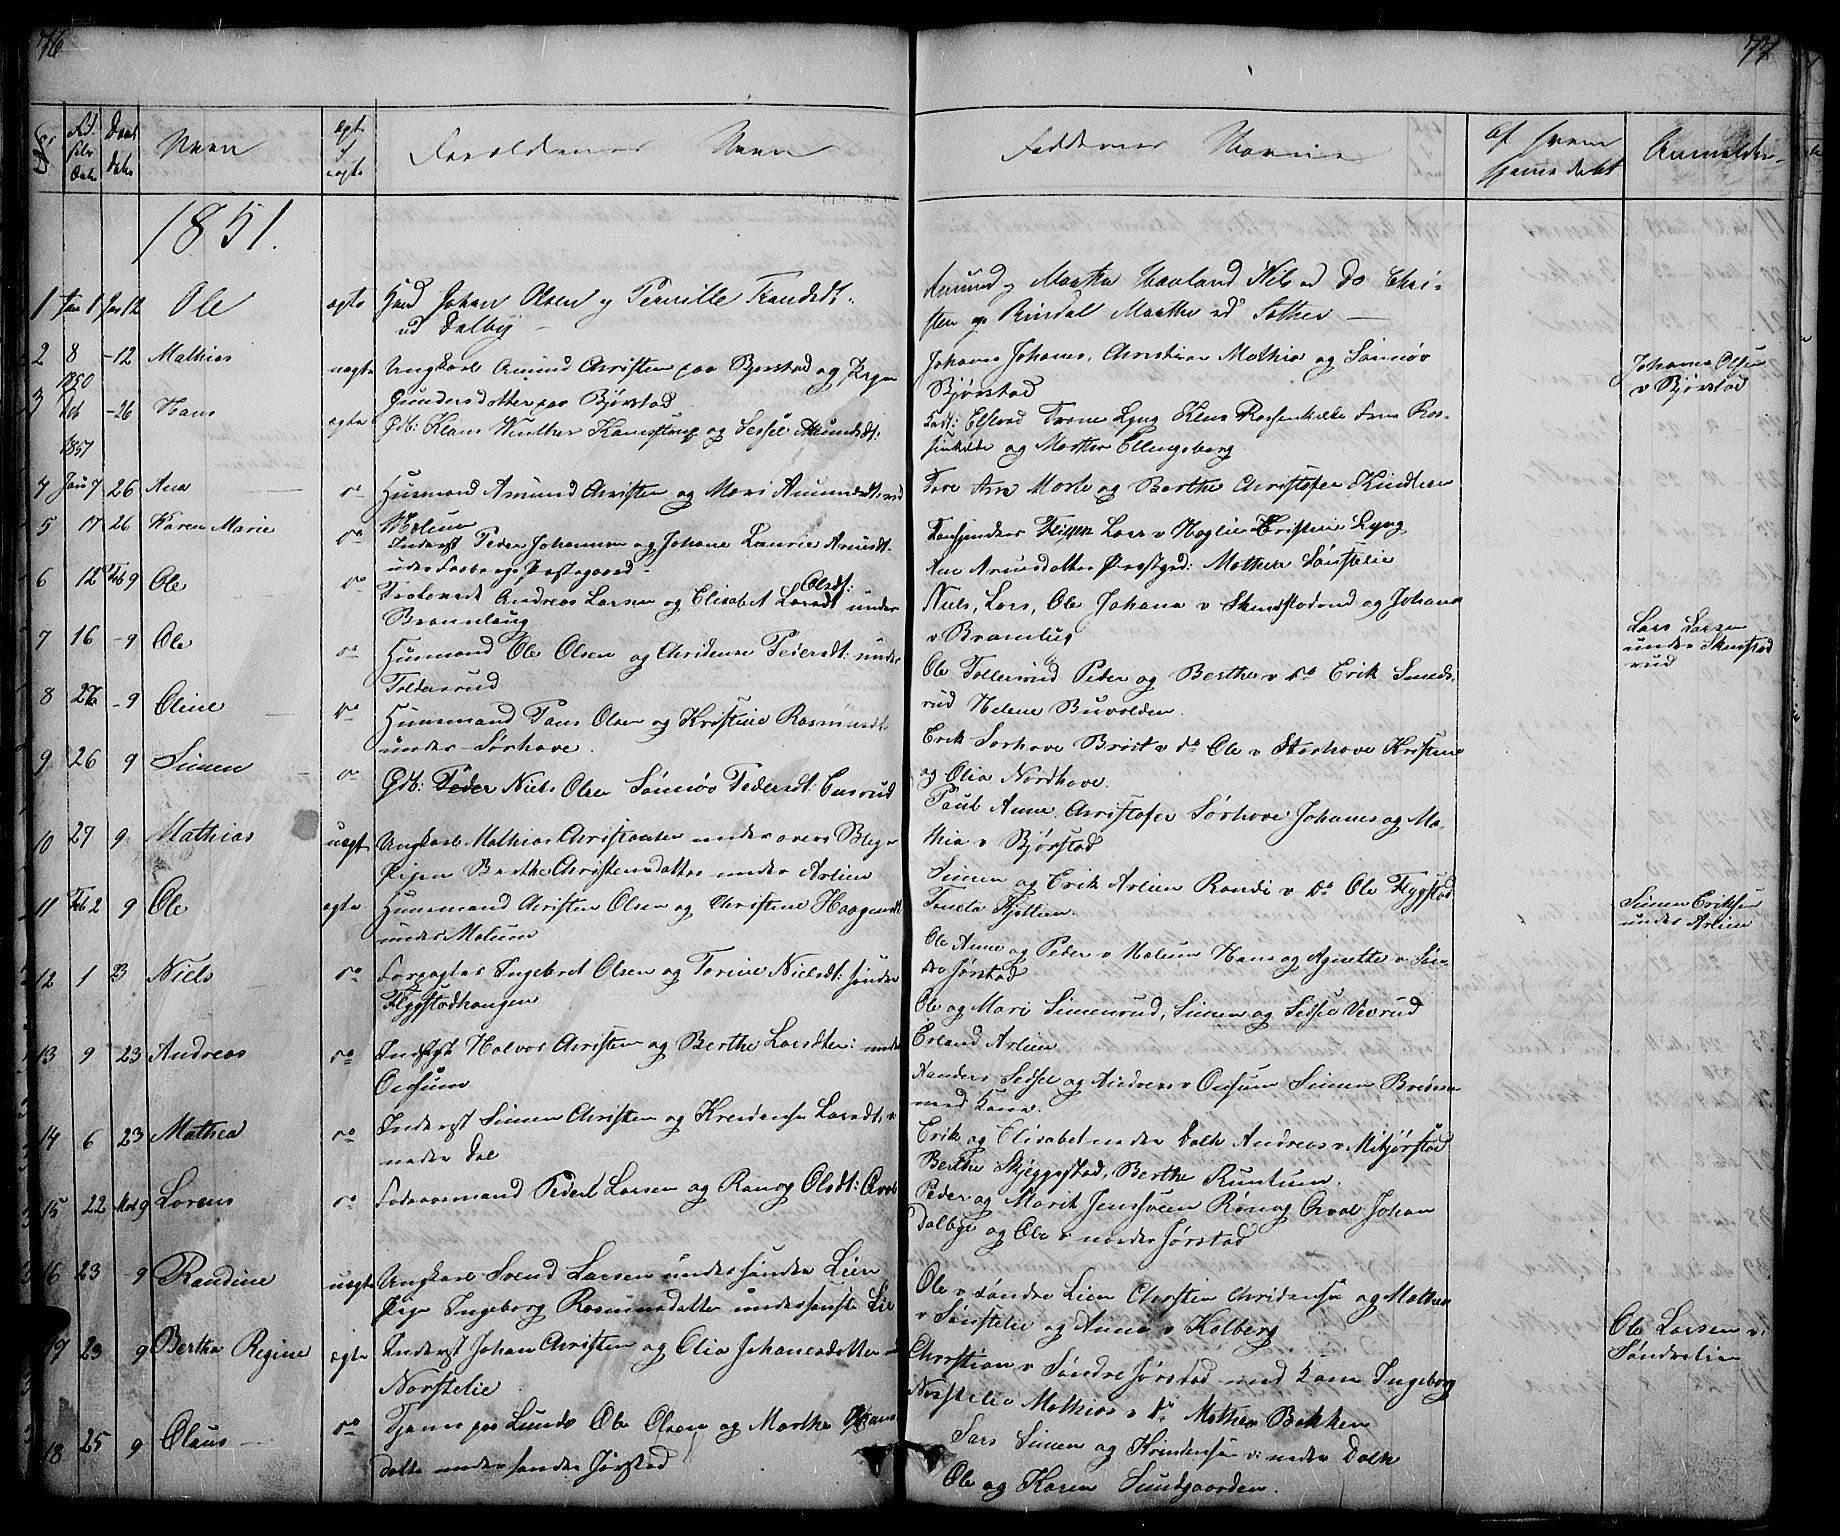 SAH, Fåberg prestekontor, Klokkerbok nr. 5, 1837-1864, s. 76-77